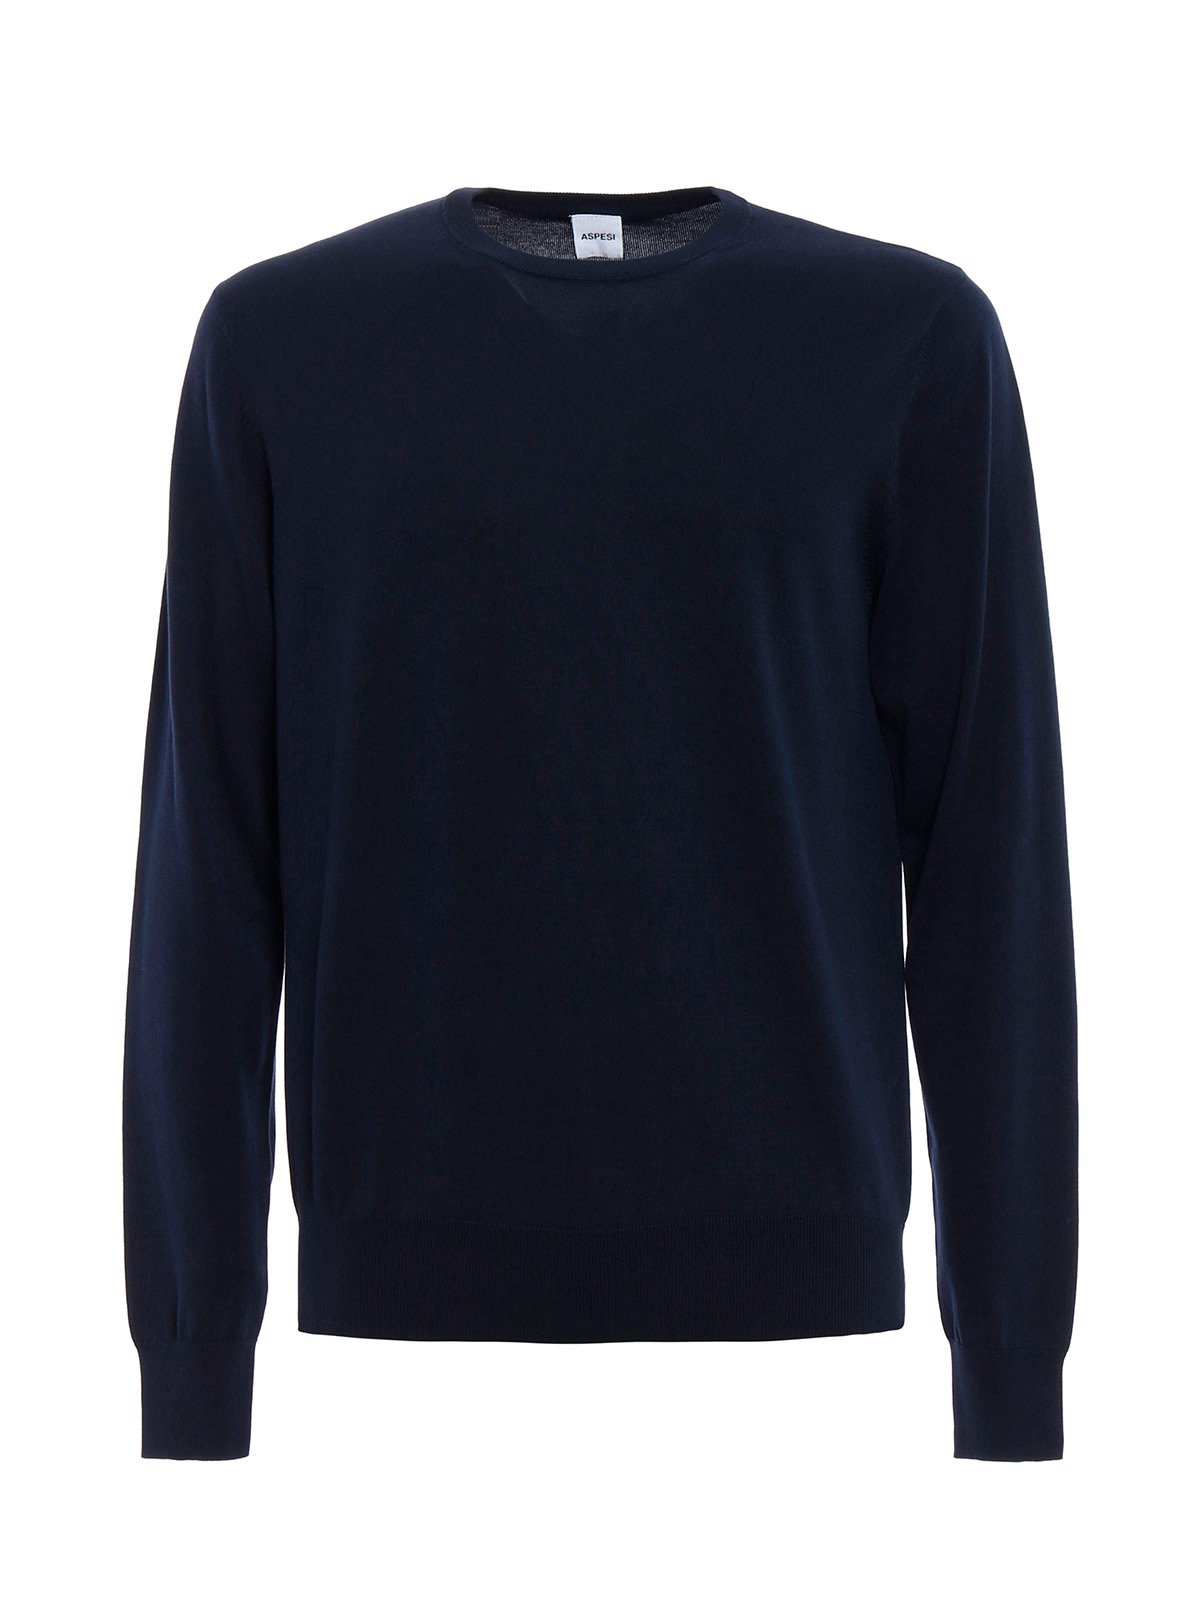 Picture of ASPESI | Men's Sweater Crewneck